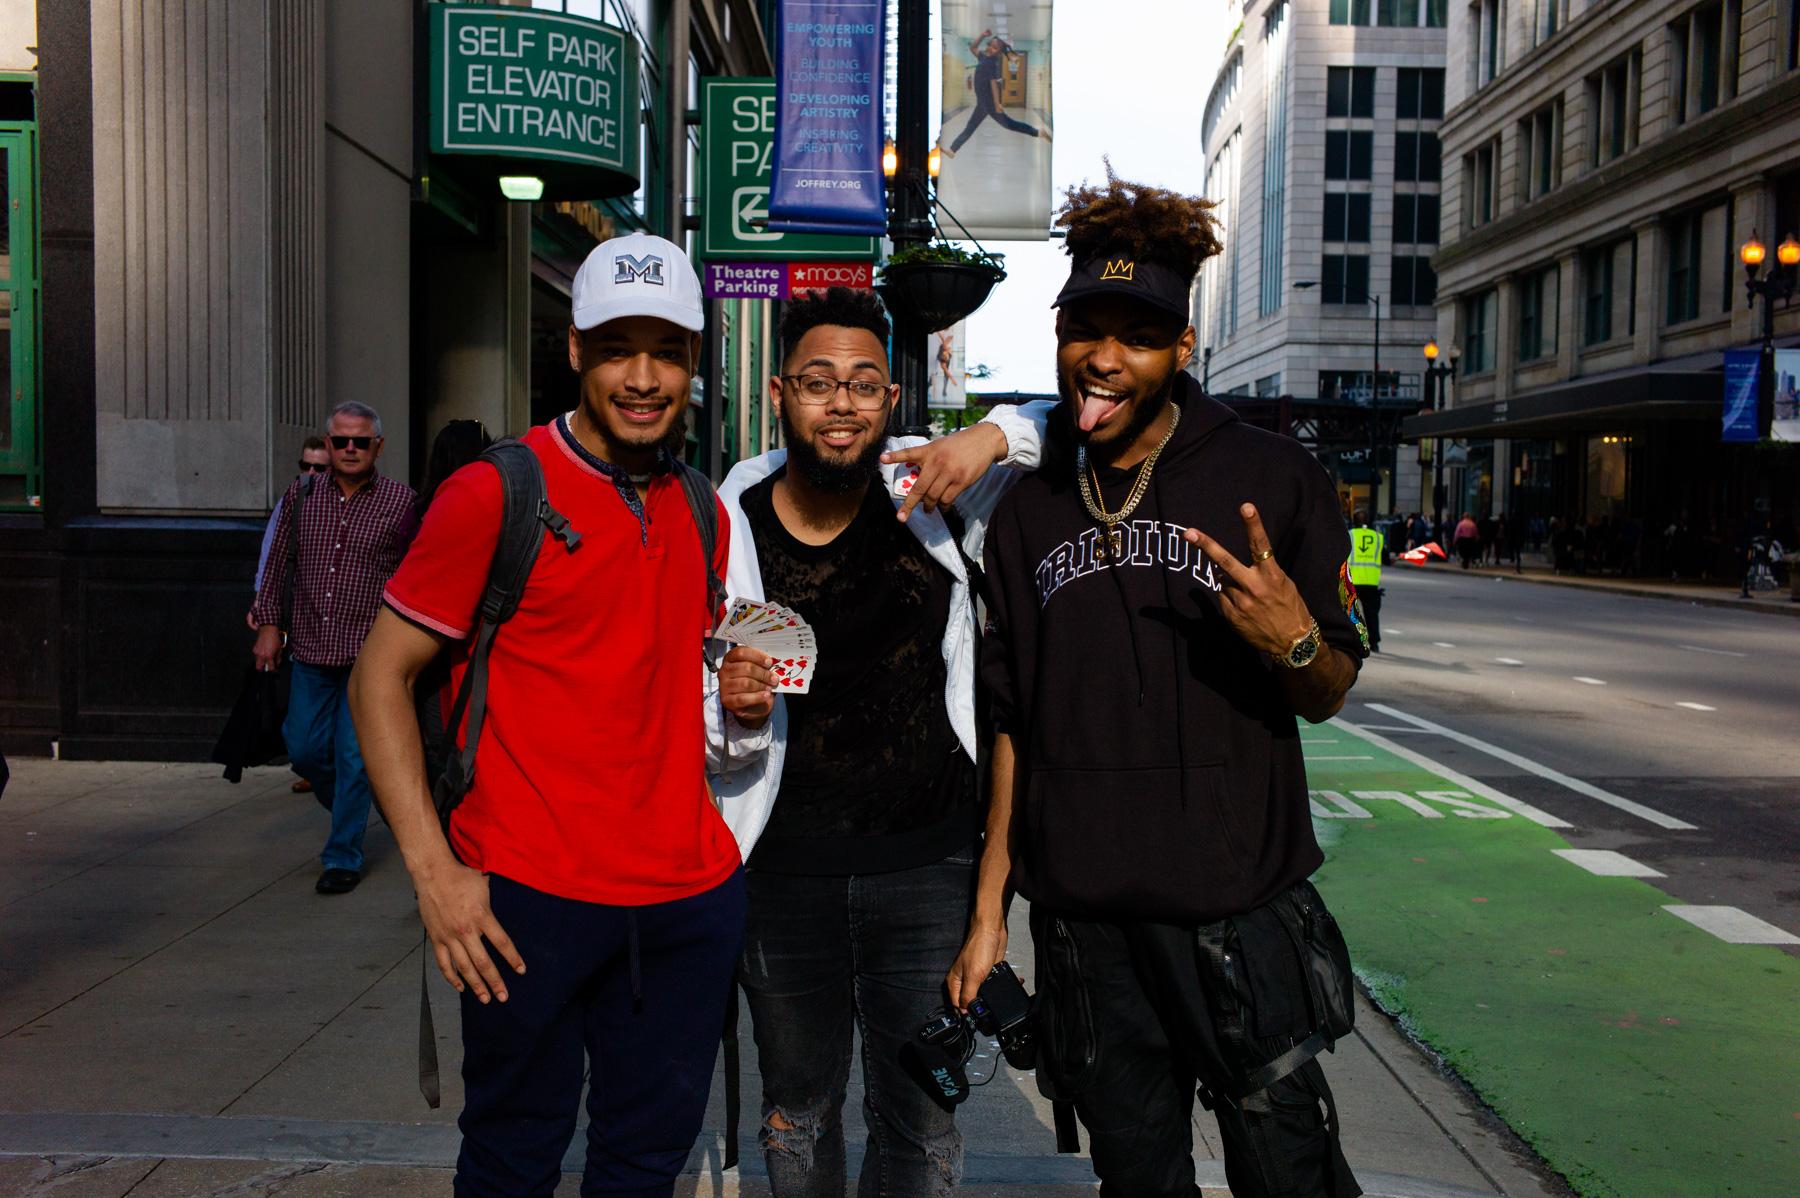 Ran into the famous magician Jibrizy! (far right)